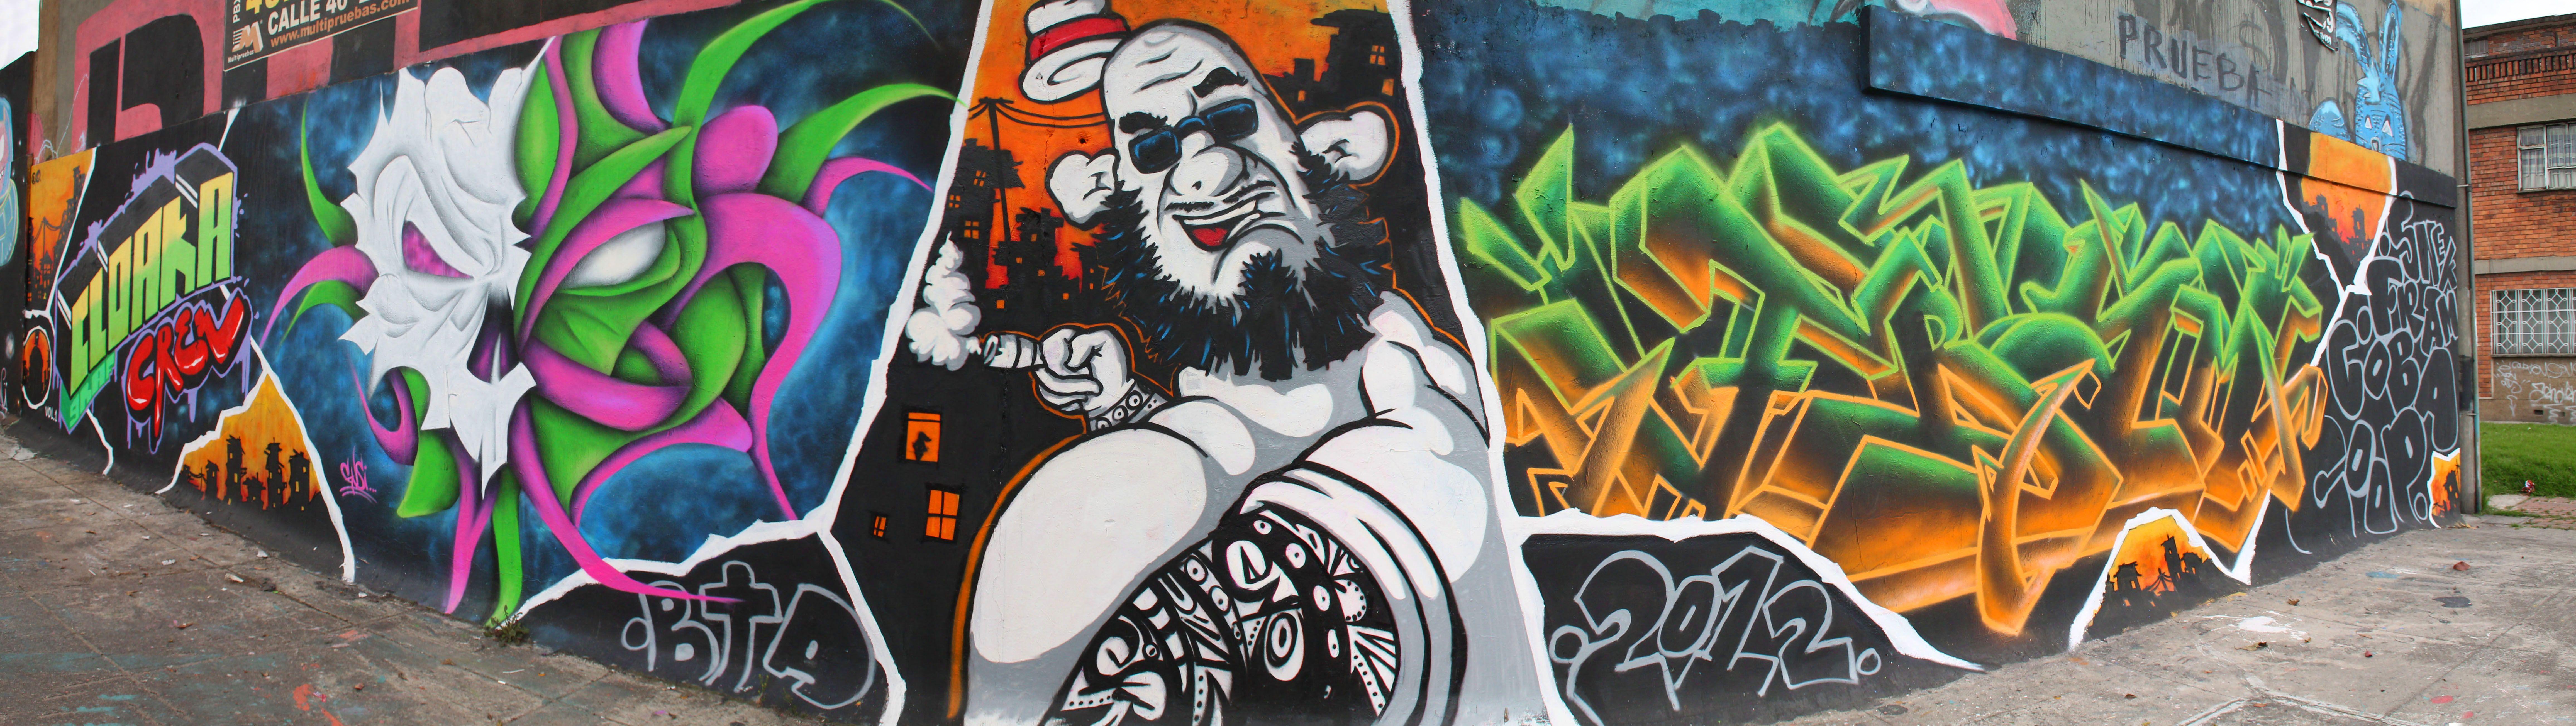 Graffitis en la Cr 30   Fotos: Mauricio Leon